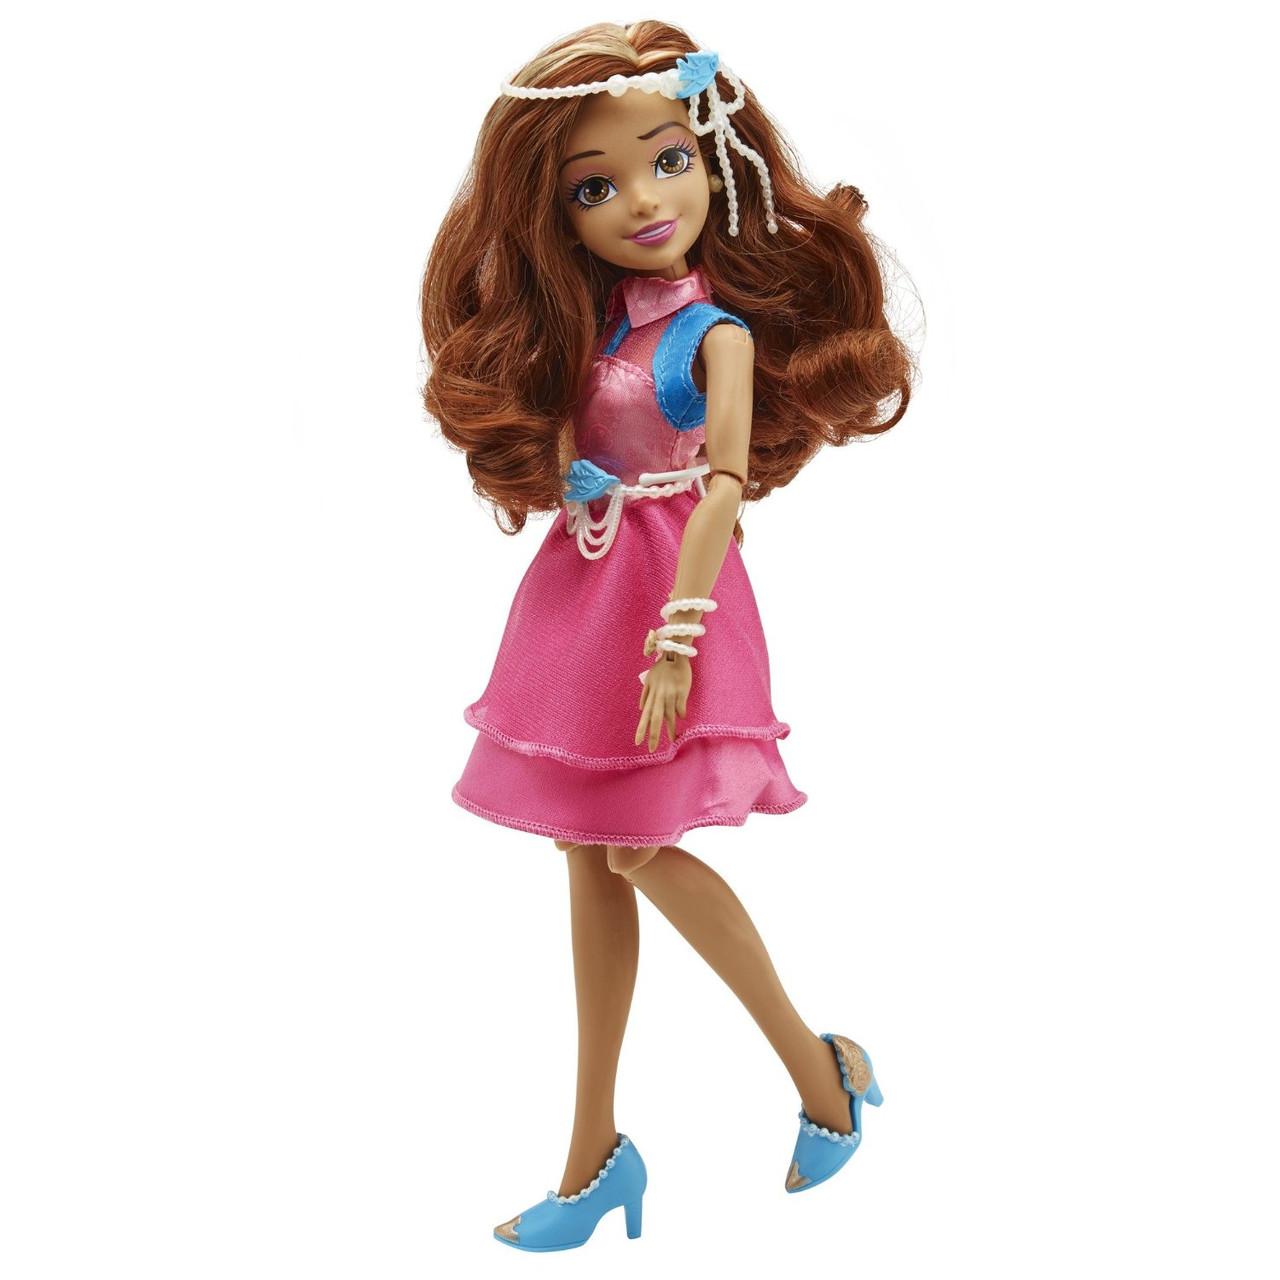 Лялька Спадкоємці Дісней Одрі / Disney Descendants Auradon Descendants Signature Audrey